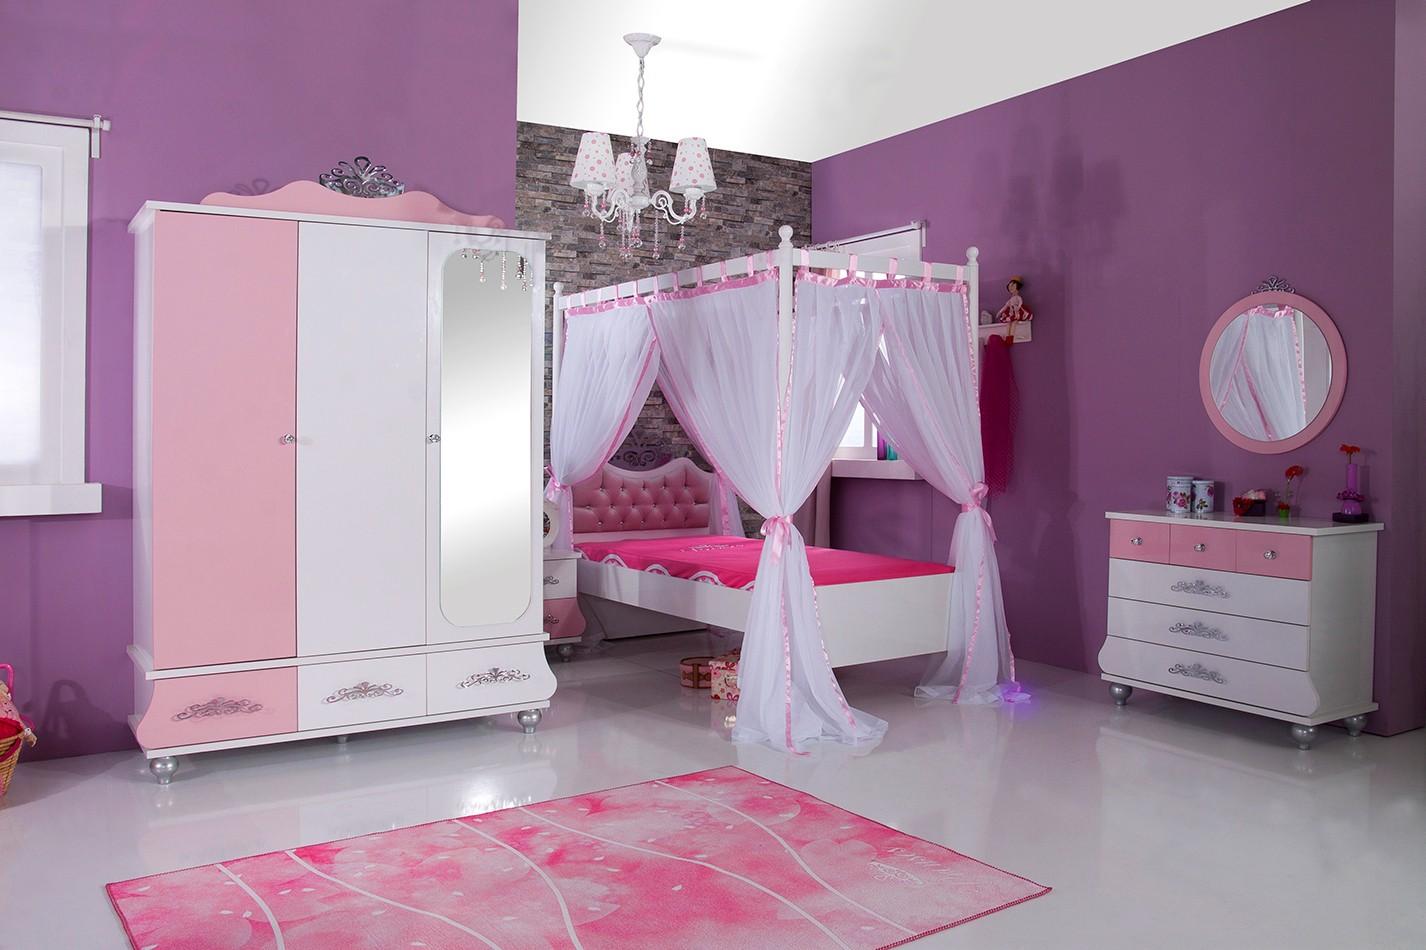 Kinderkamer Lamp Roze : Prinses tafellamp kinderkamer roze Kinderkamer ...